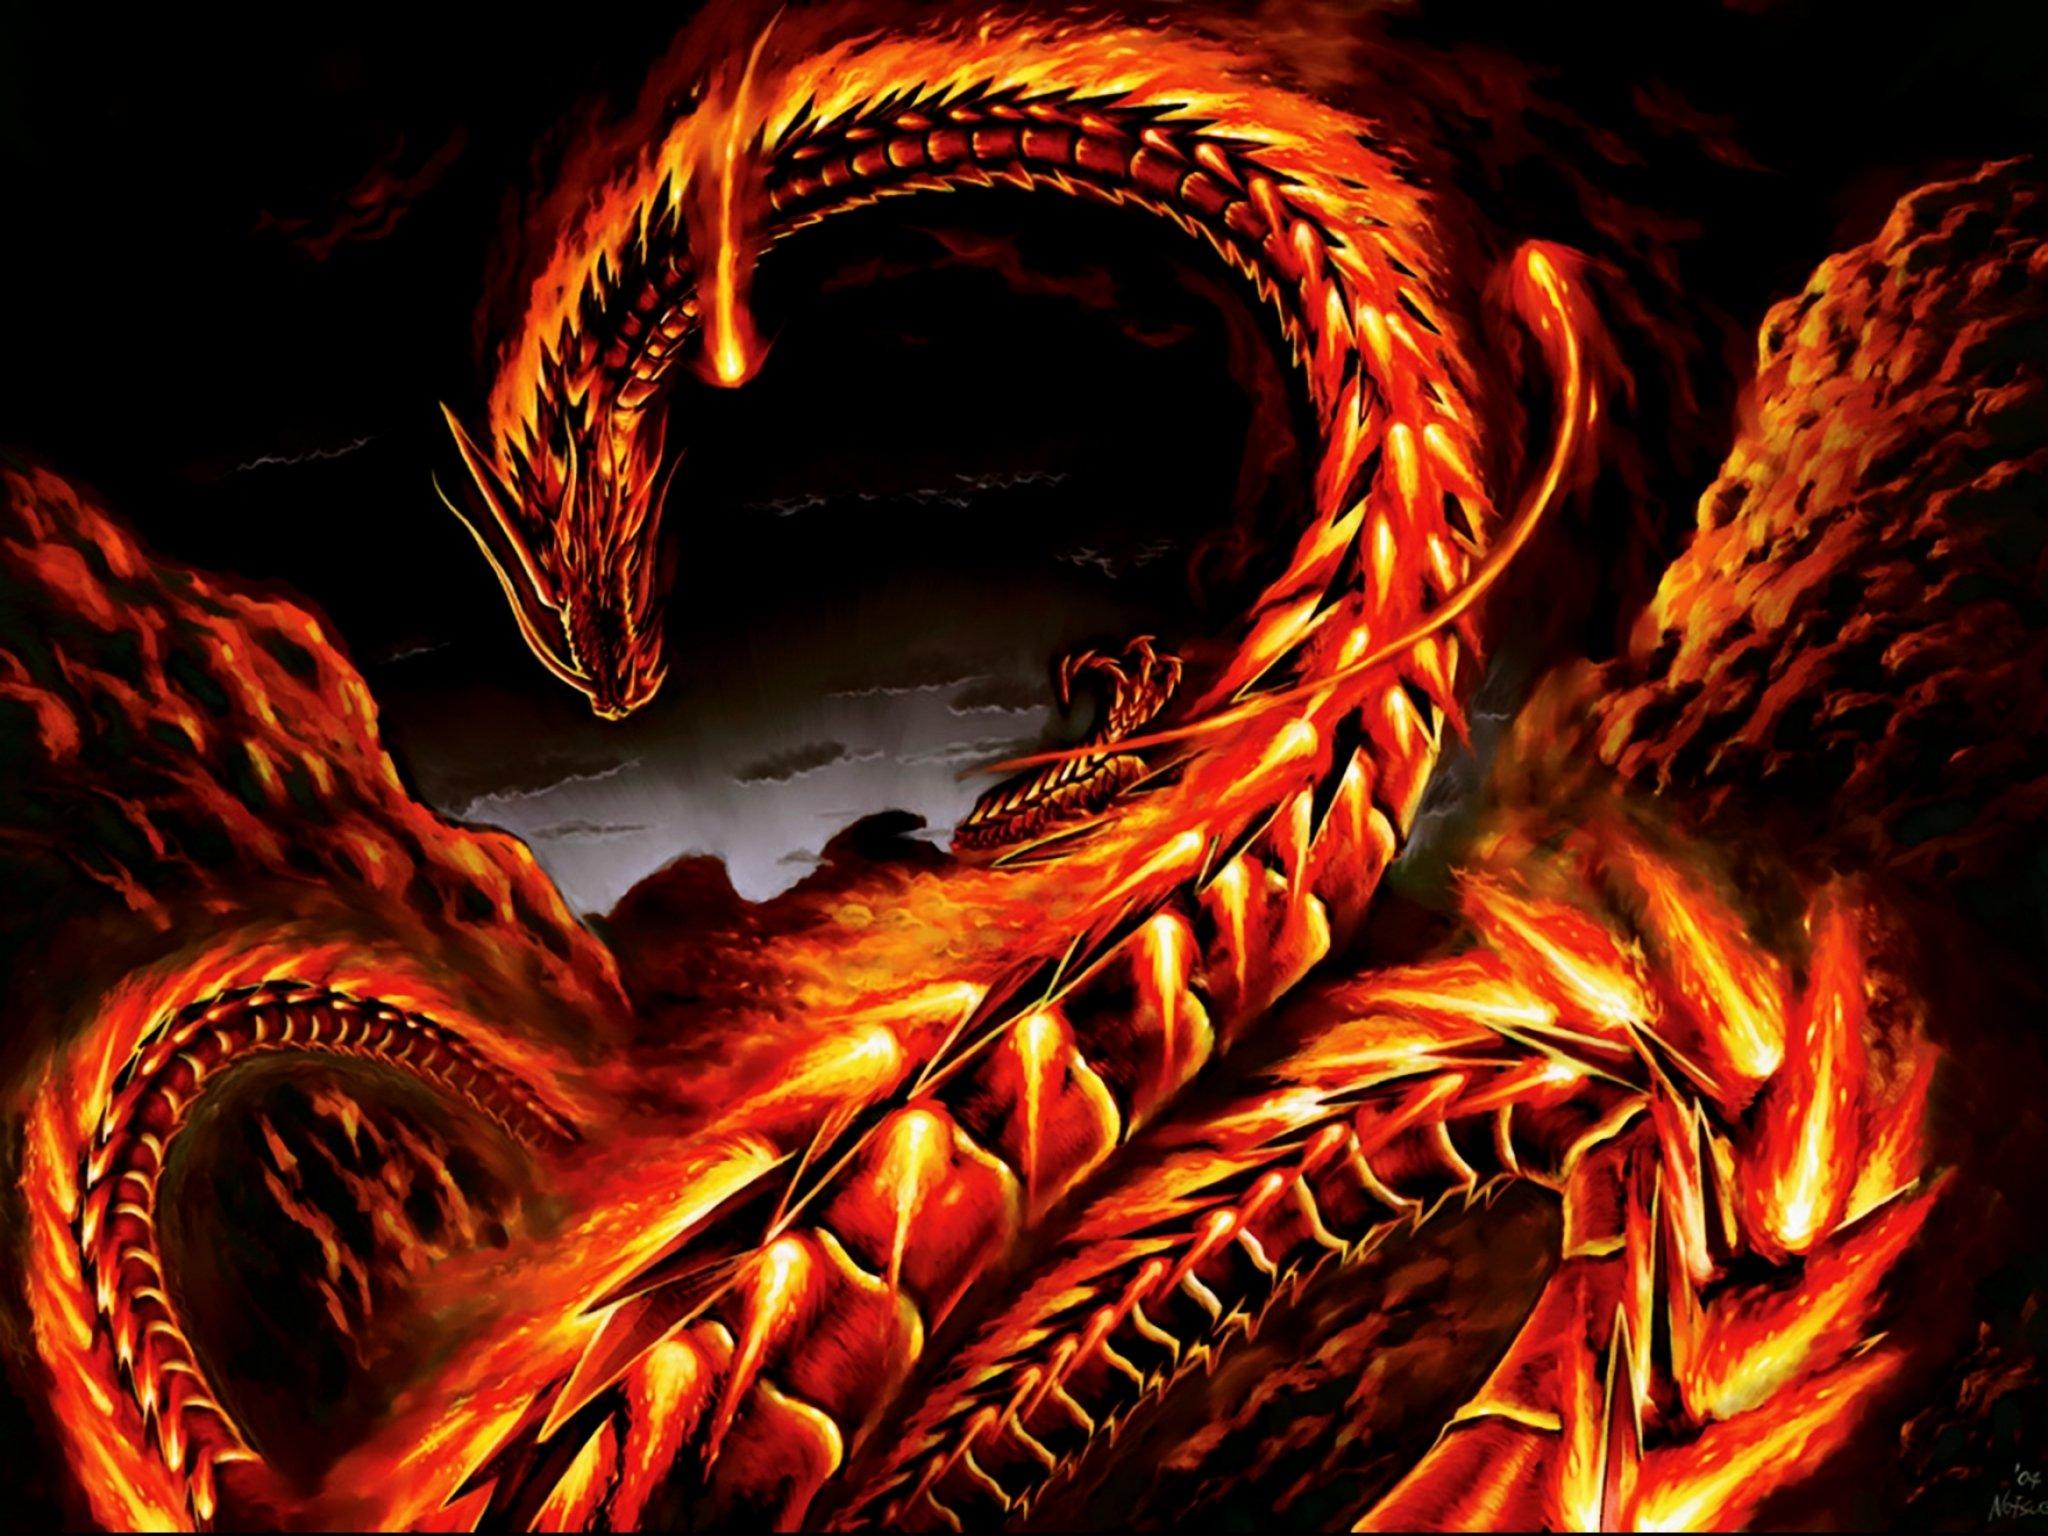 Dragon fantasy art artwork dragons wallpaper | 2048x1536 | 650912 | WallpaperUP